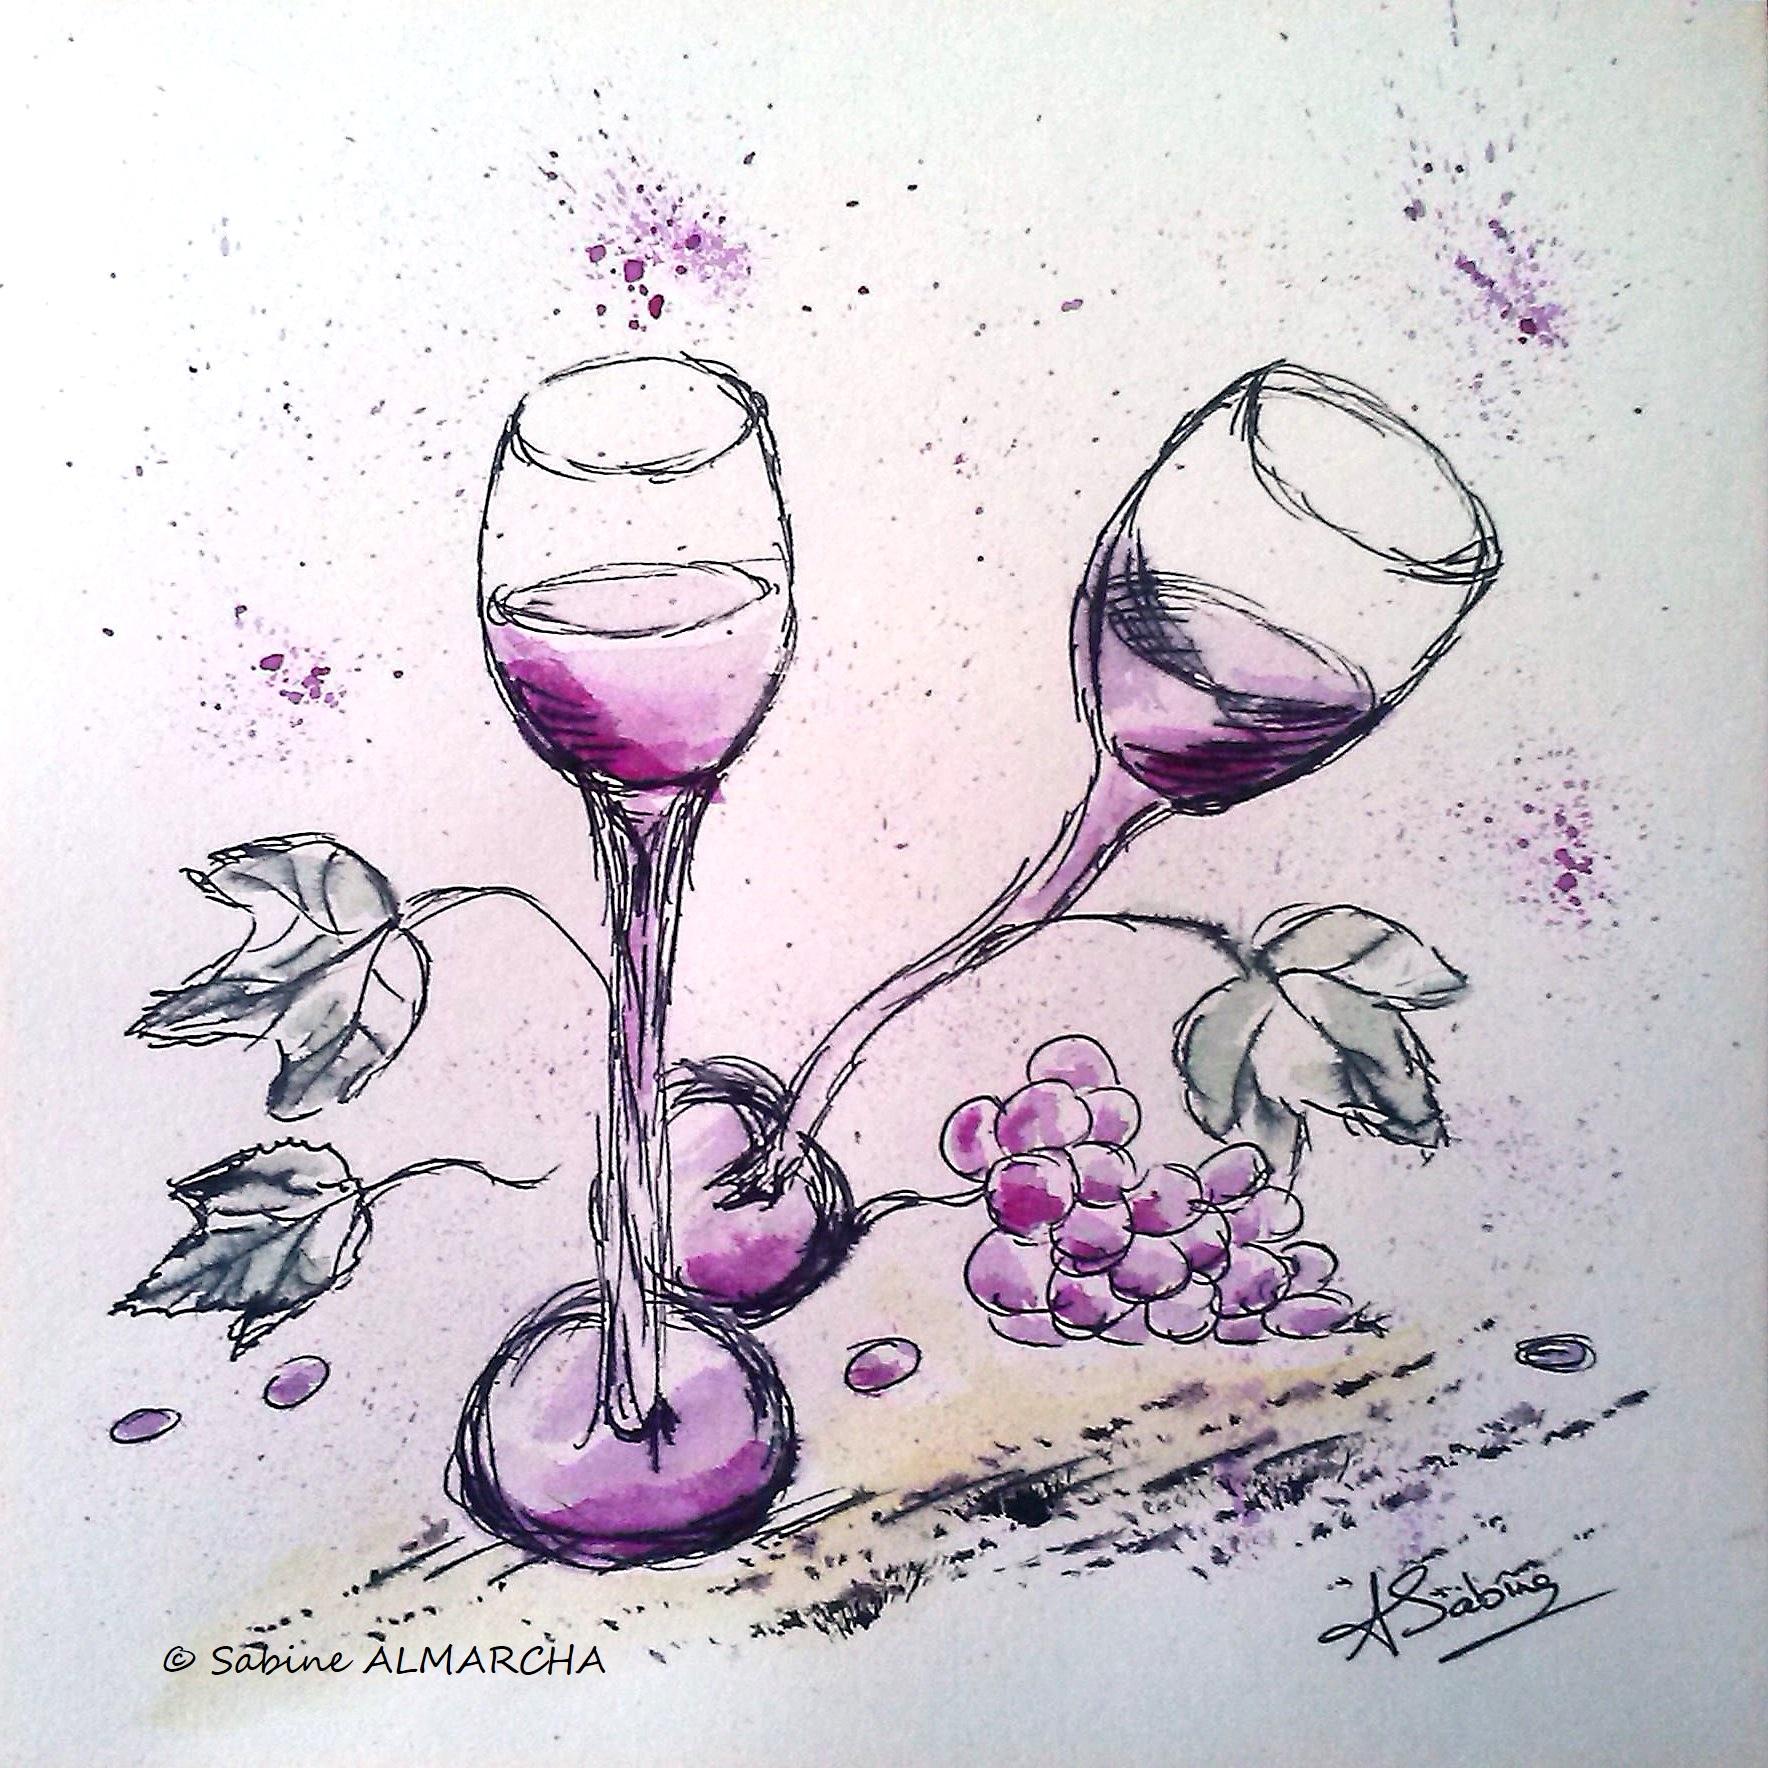 Le raisin. 8